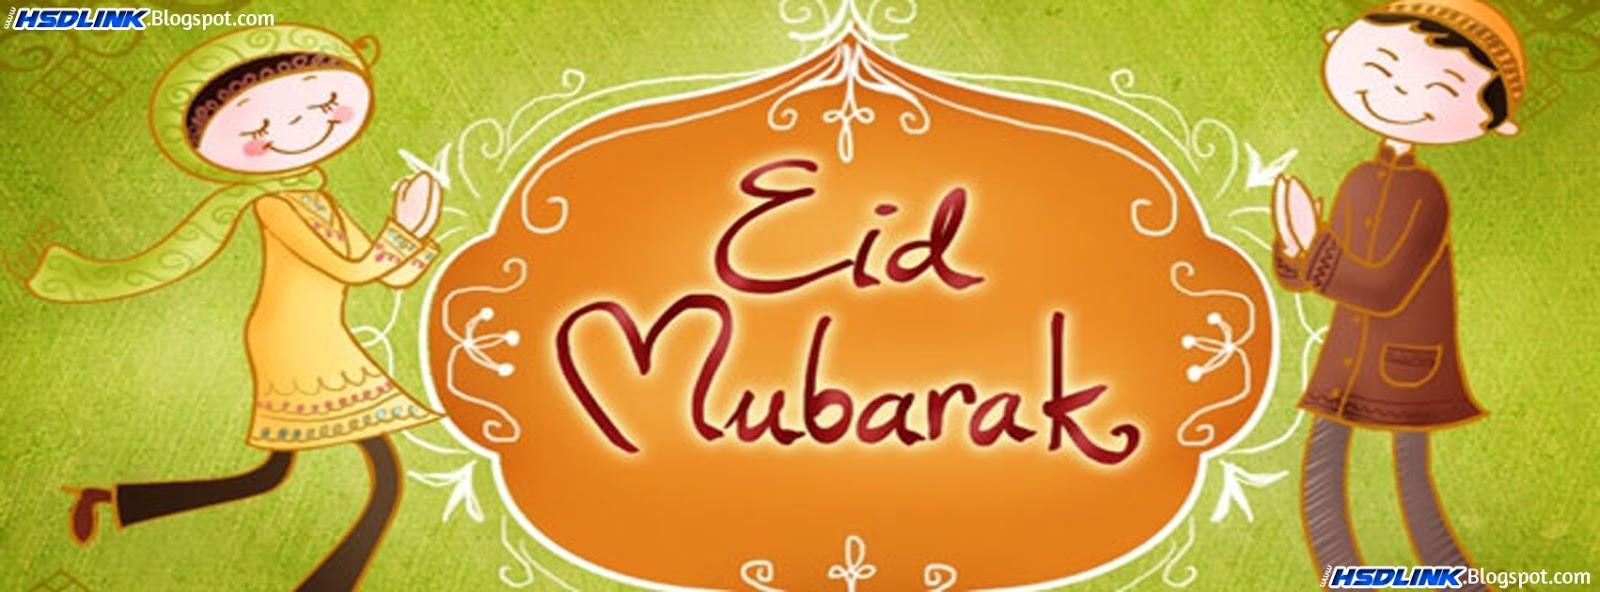 Popular Facebook Cover Eid Al-Fitr Greeting - Eid-Mubarak-Cards-Free-Download-6  HD_926239 .jpg